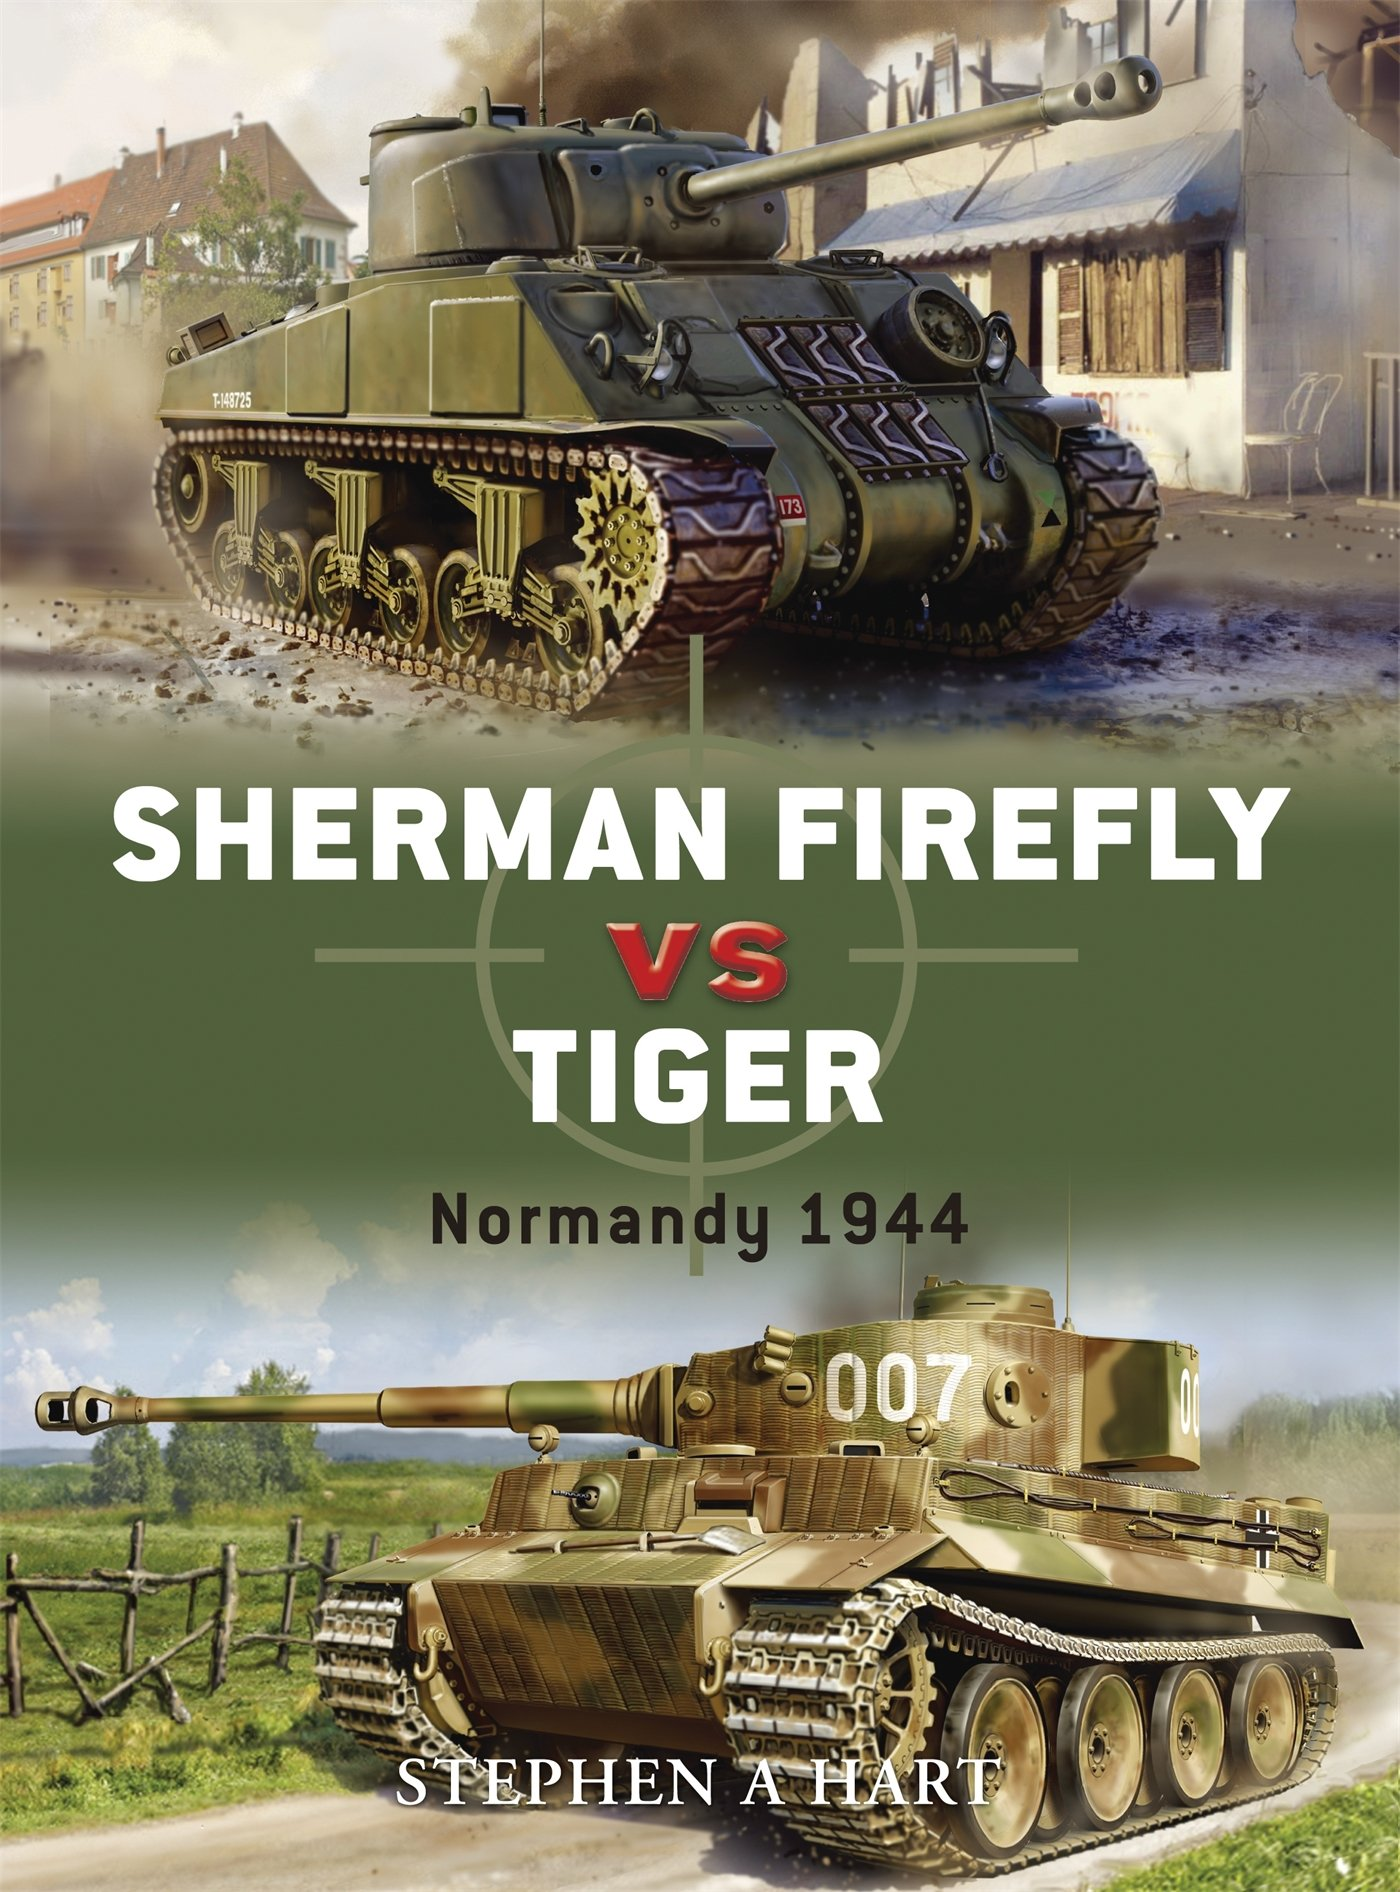 Amazon fr - Sherman Firefly vs Tiger: Normandy 1944